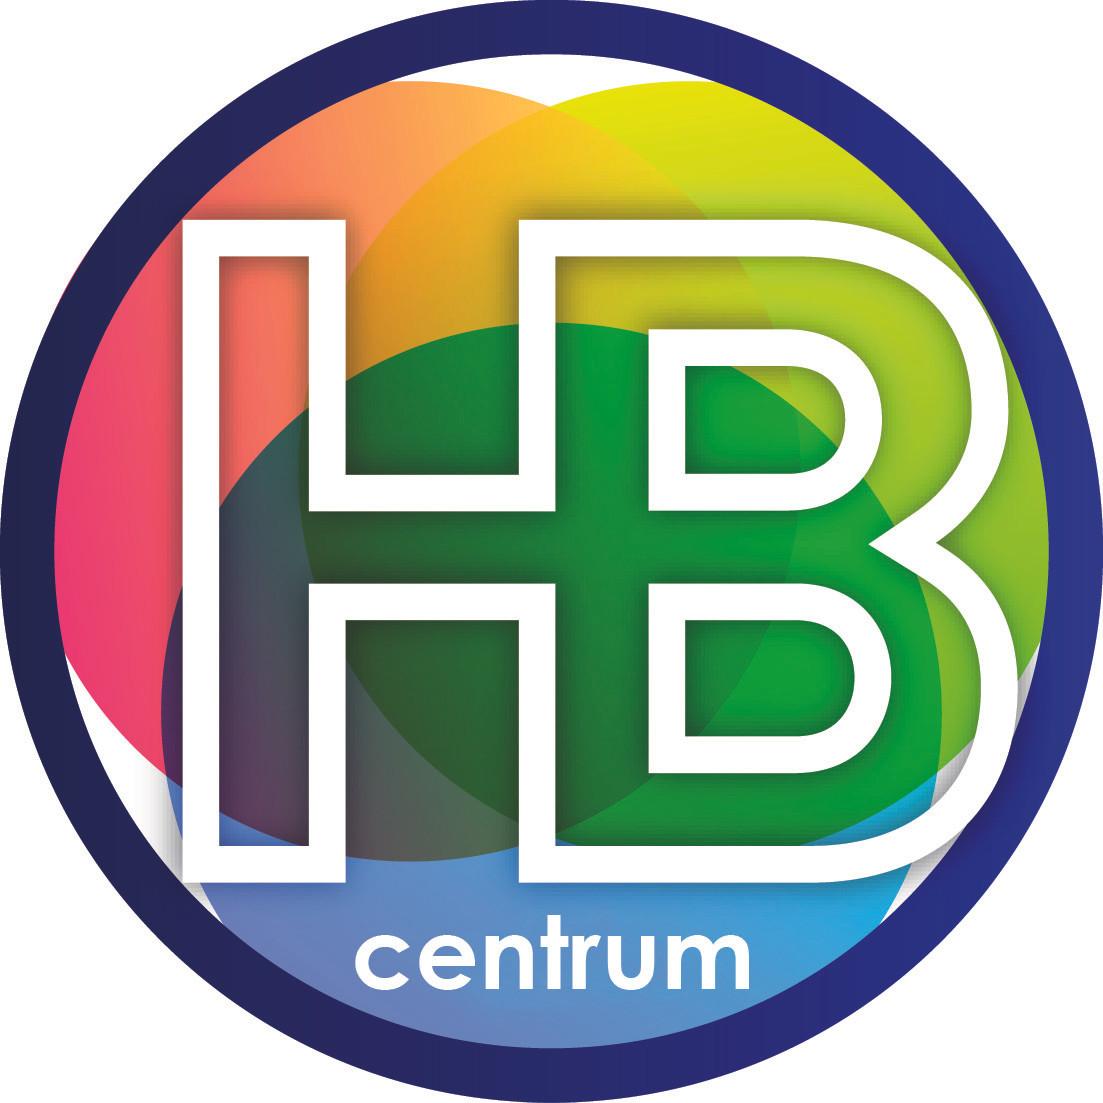 Opleiding tot HB professional